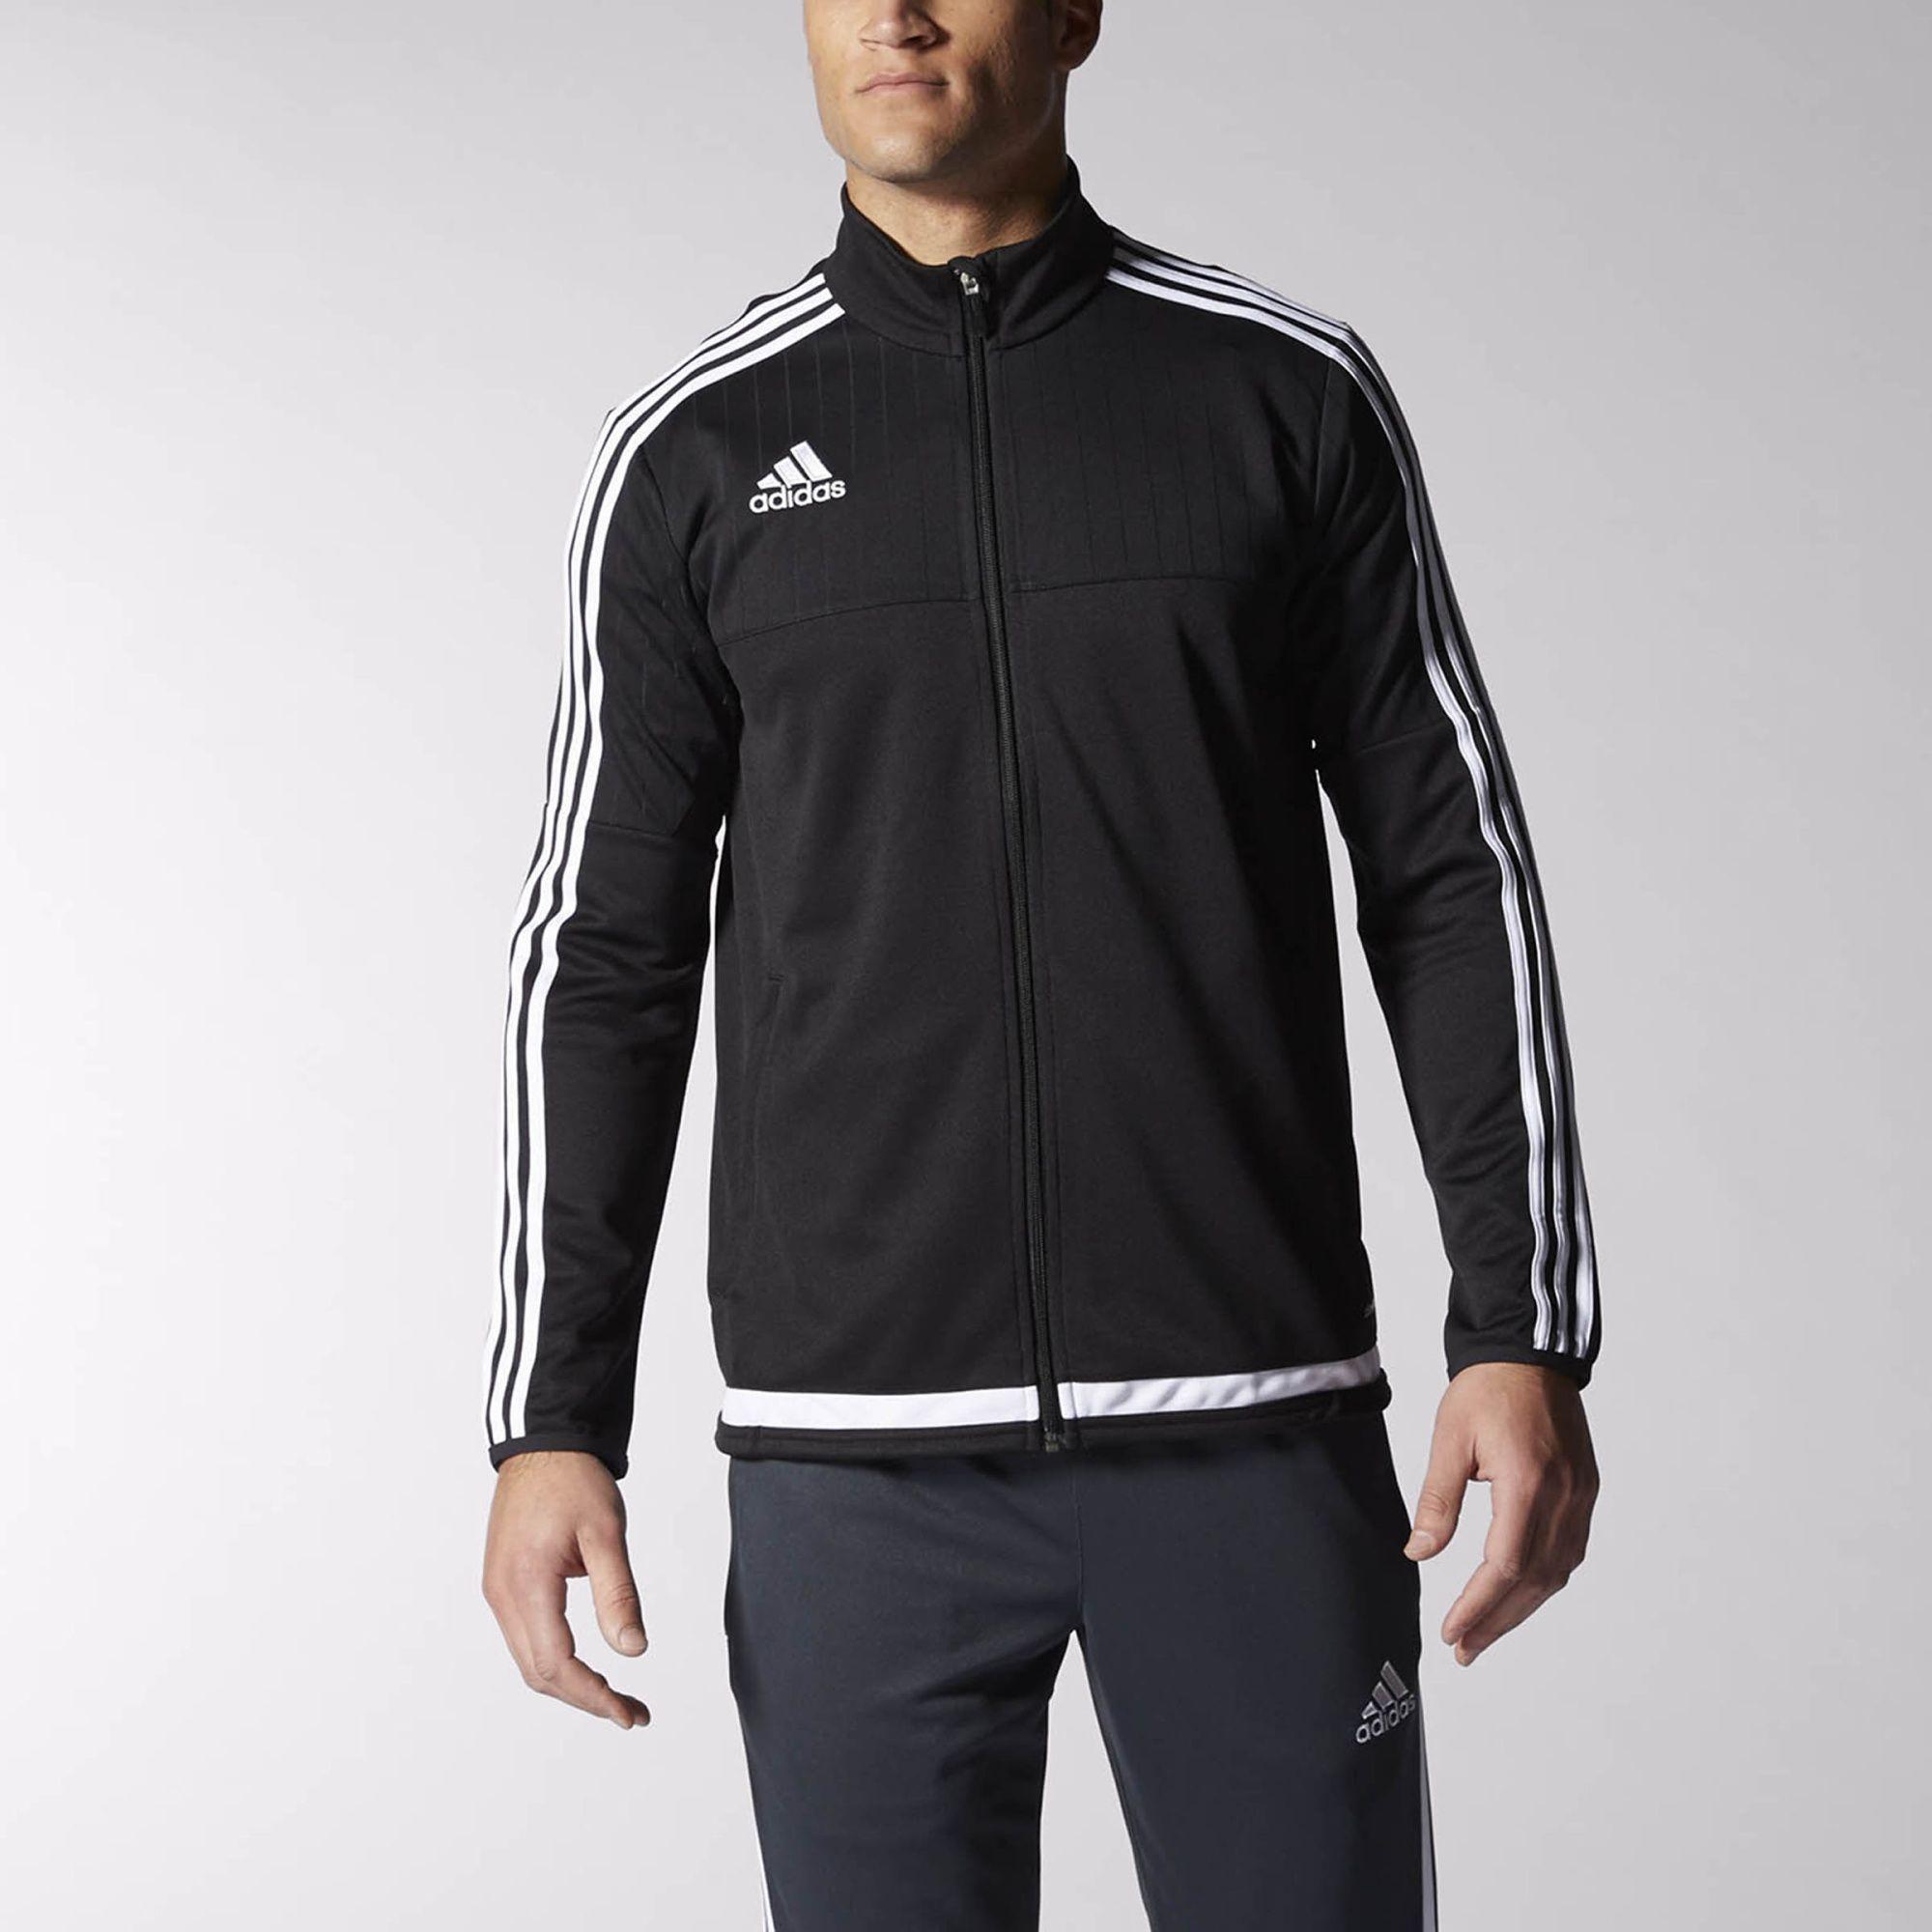 Adidas Tiro 15 Training Jacket